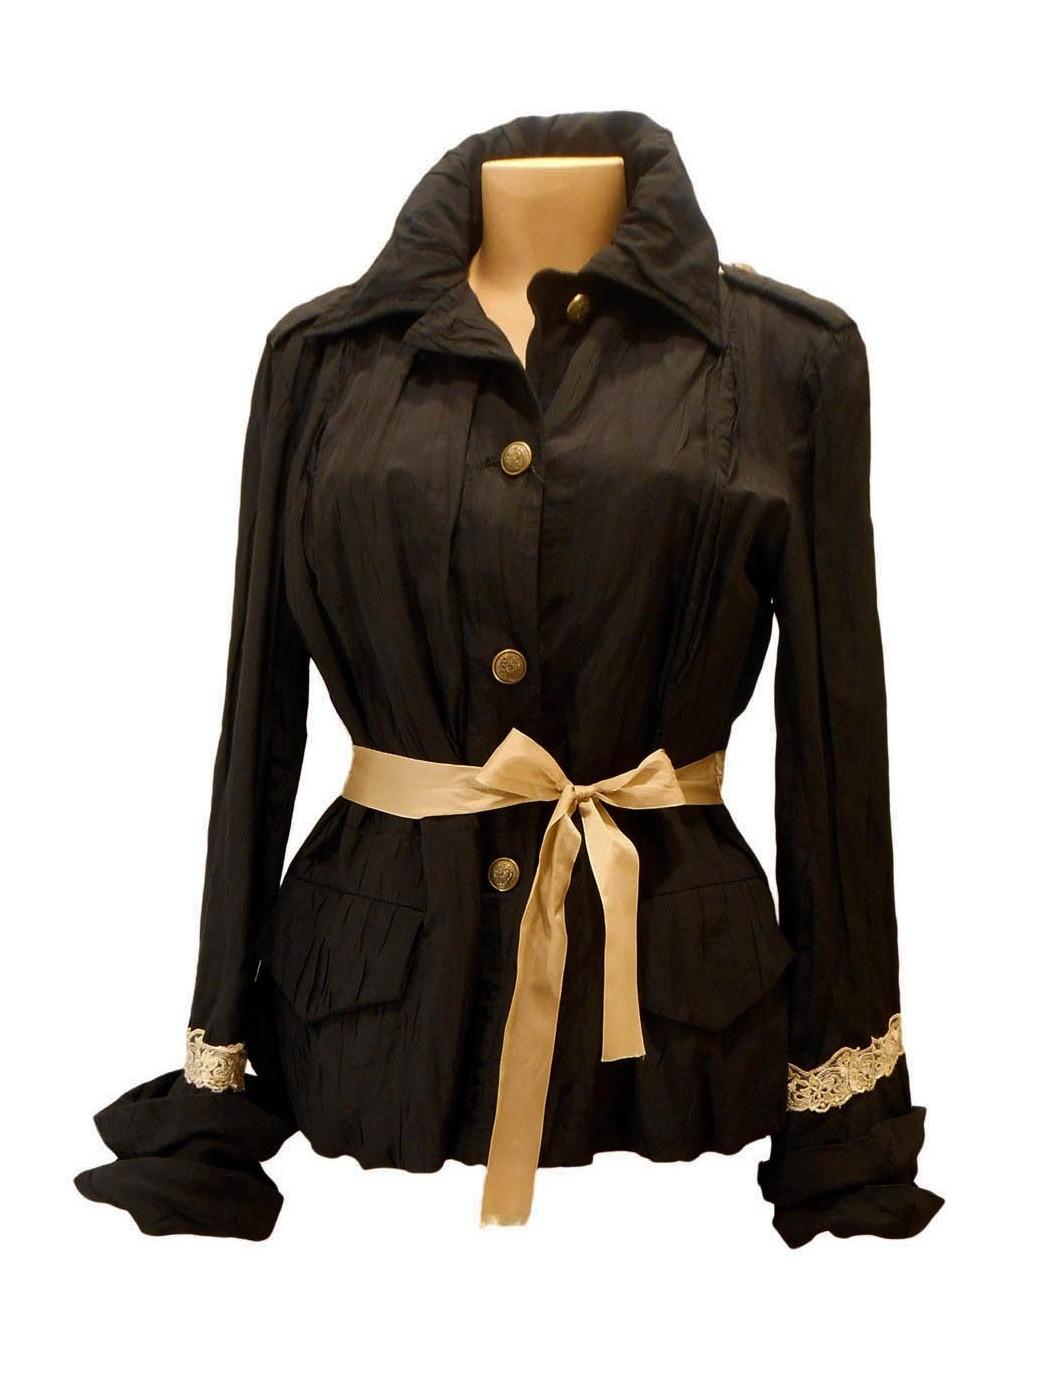 Giacca elegante nera e beige